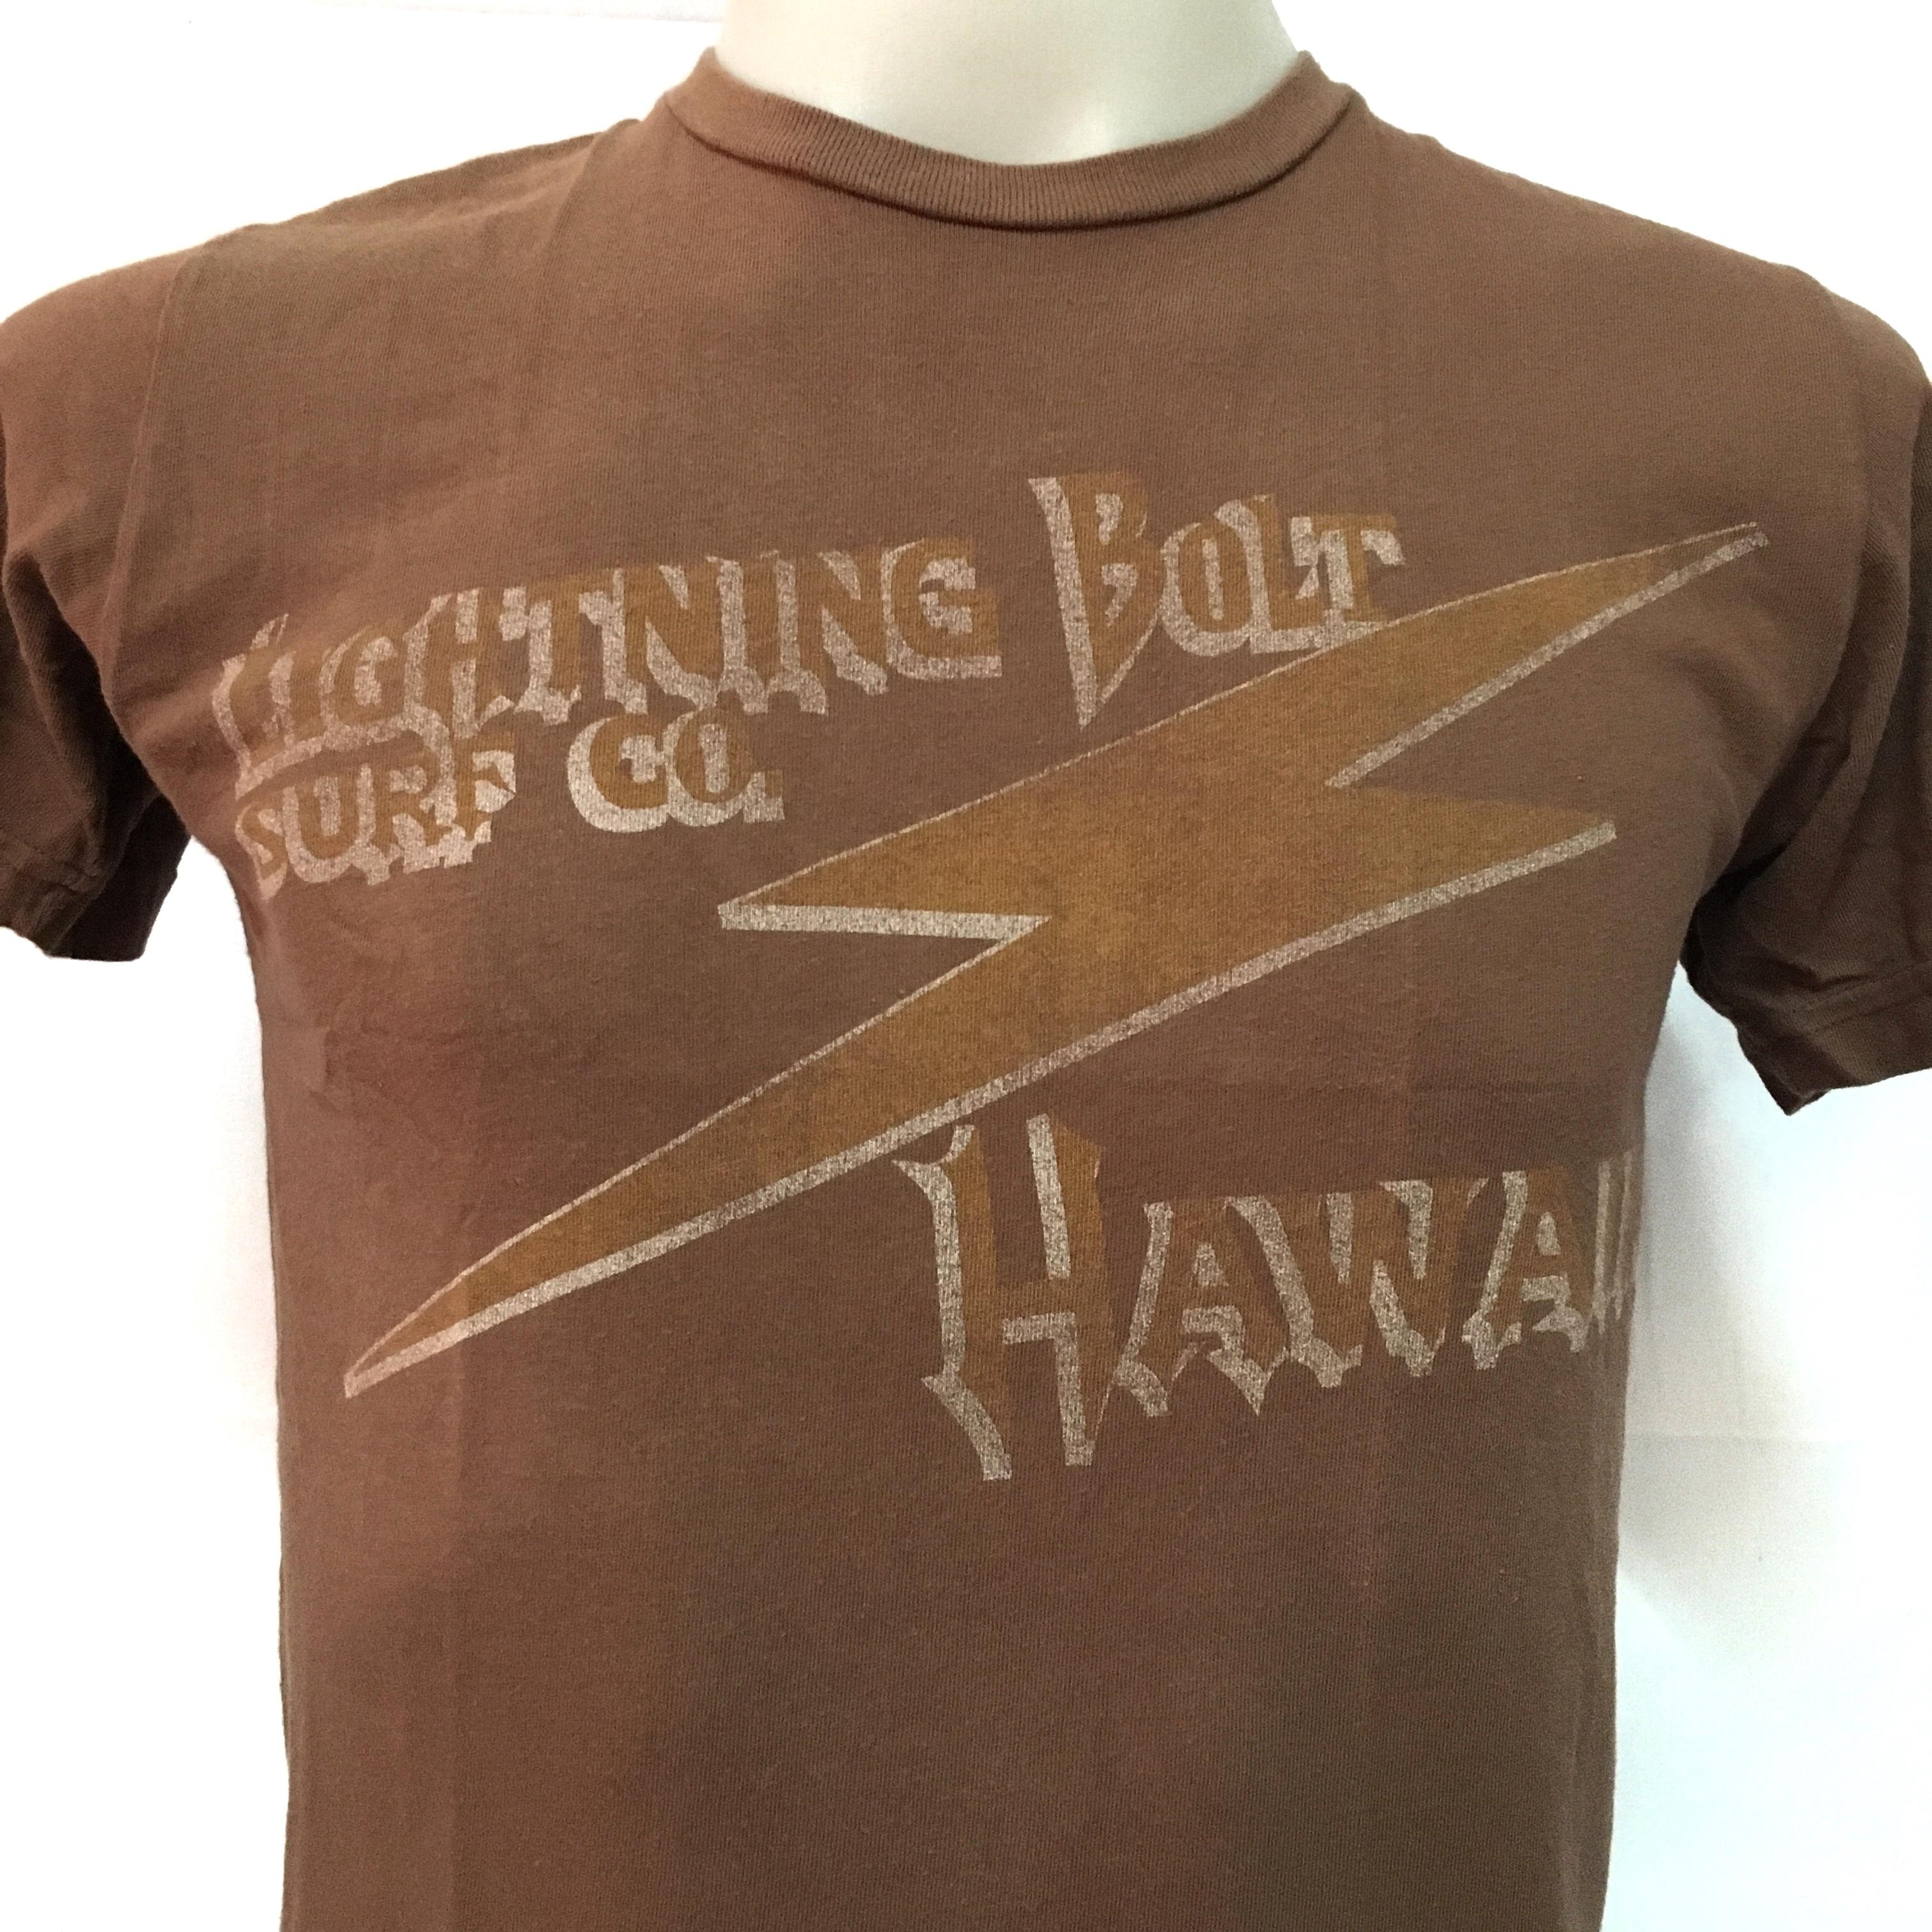 Lightning Bolt Polo Styled Shirt Cathay Spice Lightning Bolt 100/% Cotton Surf